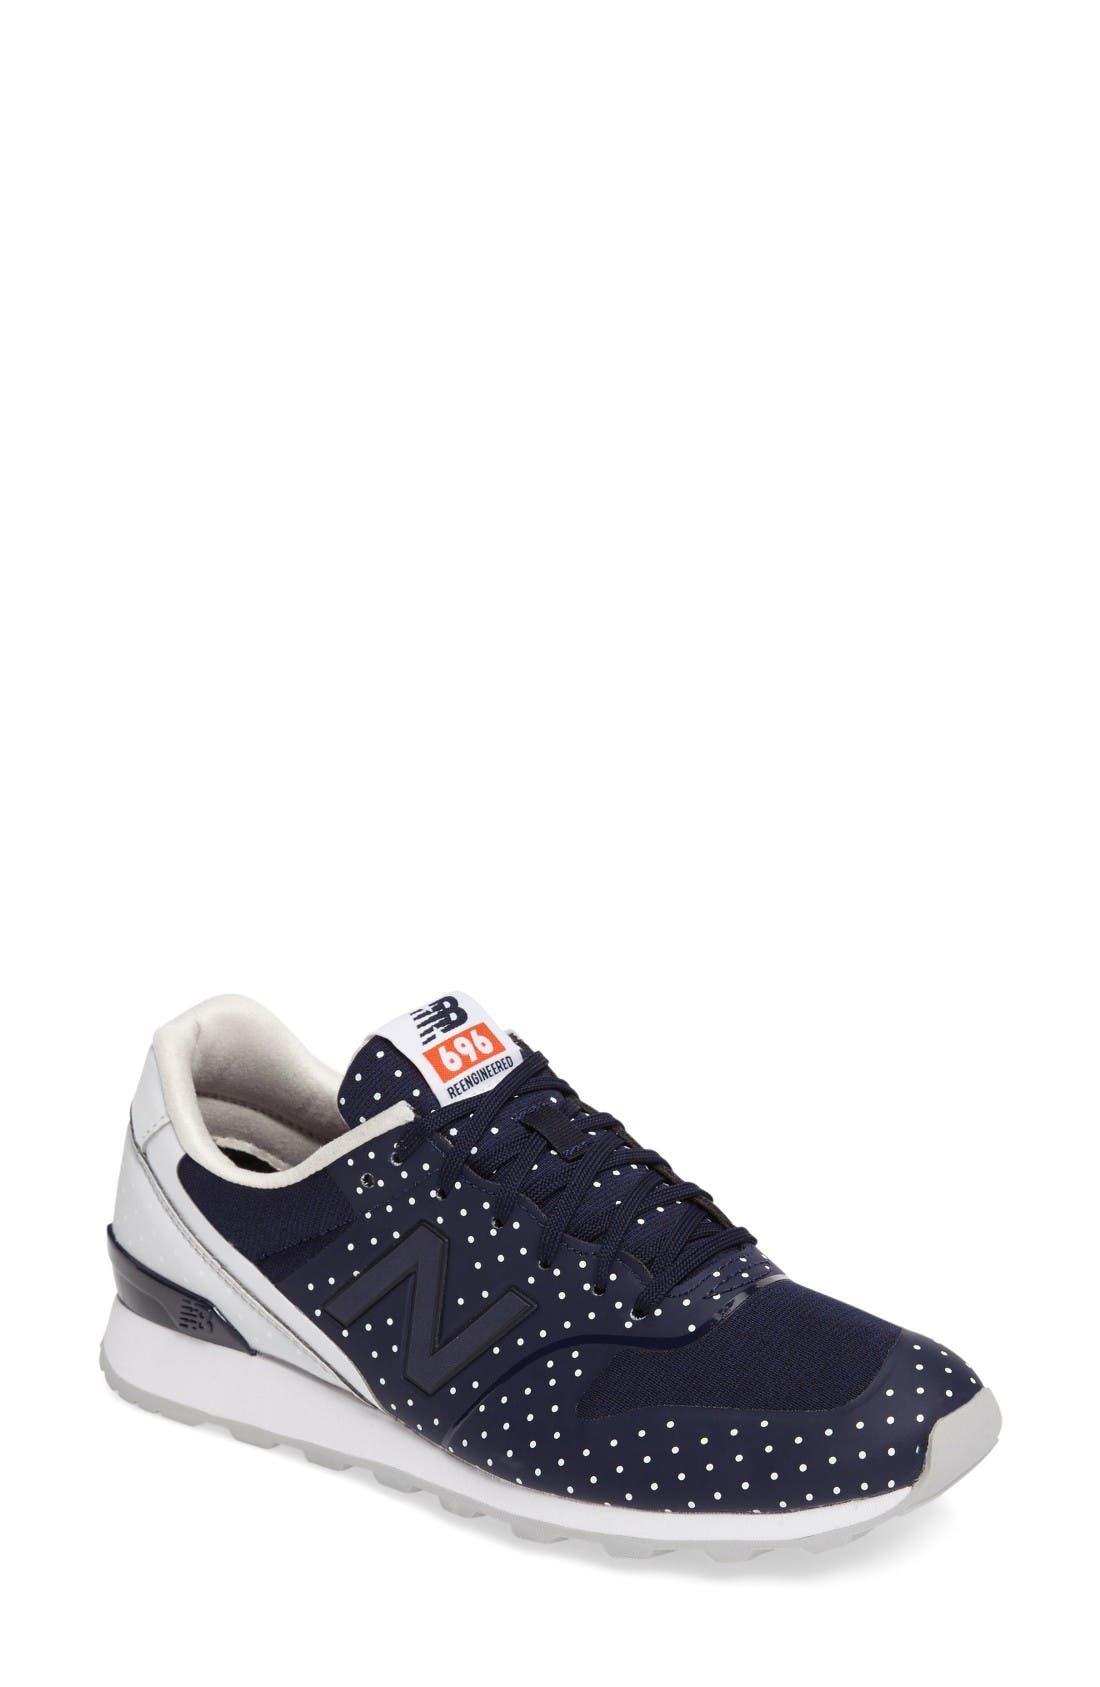 Alternate Image 1 Selected - New Balance 696 Sneaker (Women)